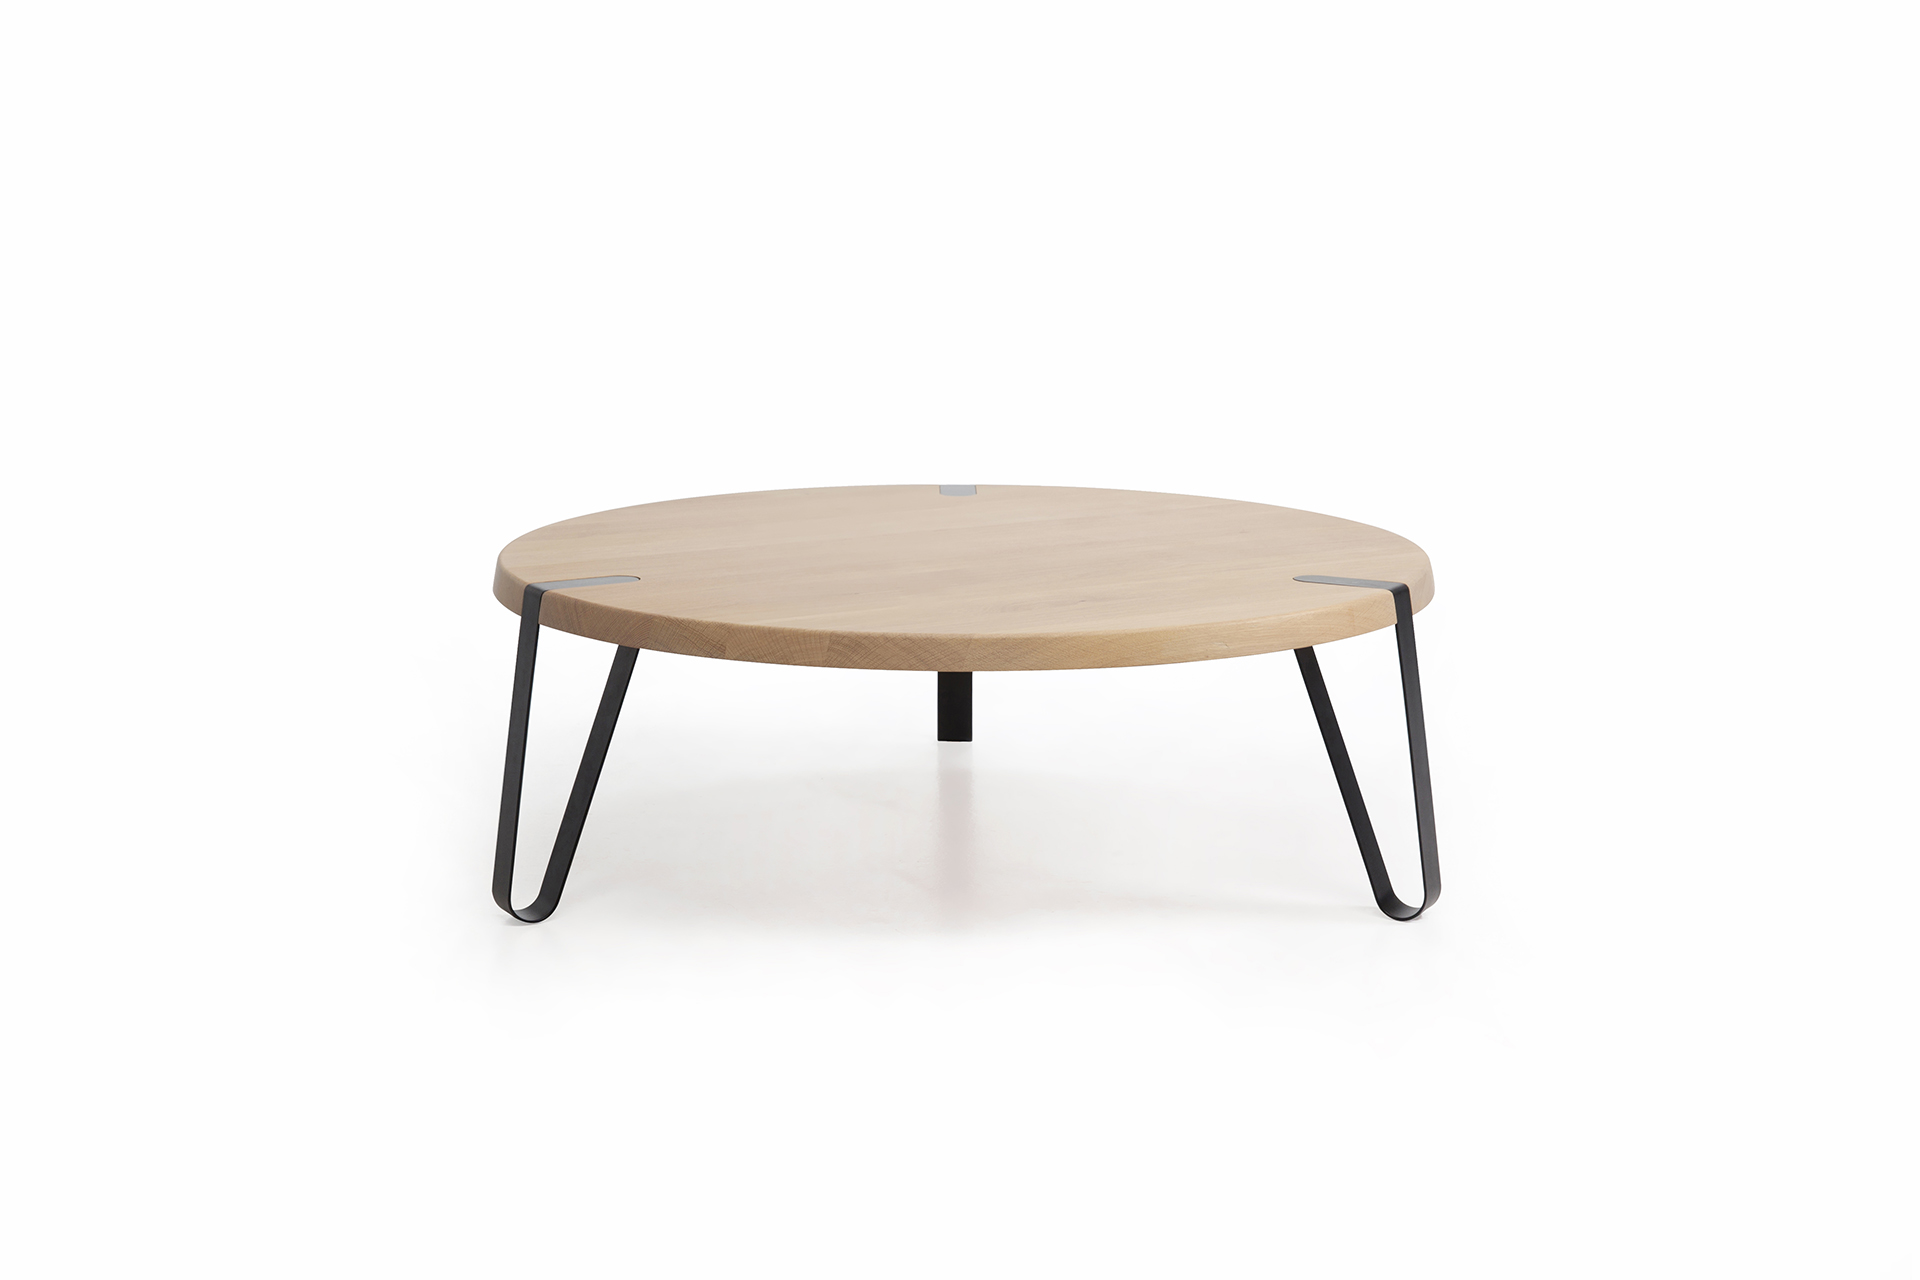 Ronde Salontafel Met Zwarte Poten.Level Rond Design Salontafel L Erik Remmers L Odesi Your Dutch Design